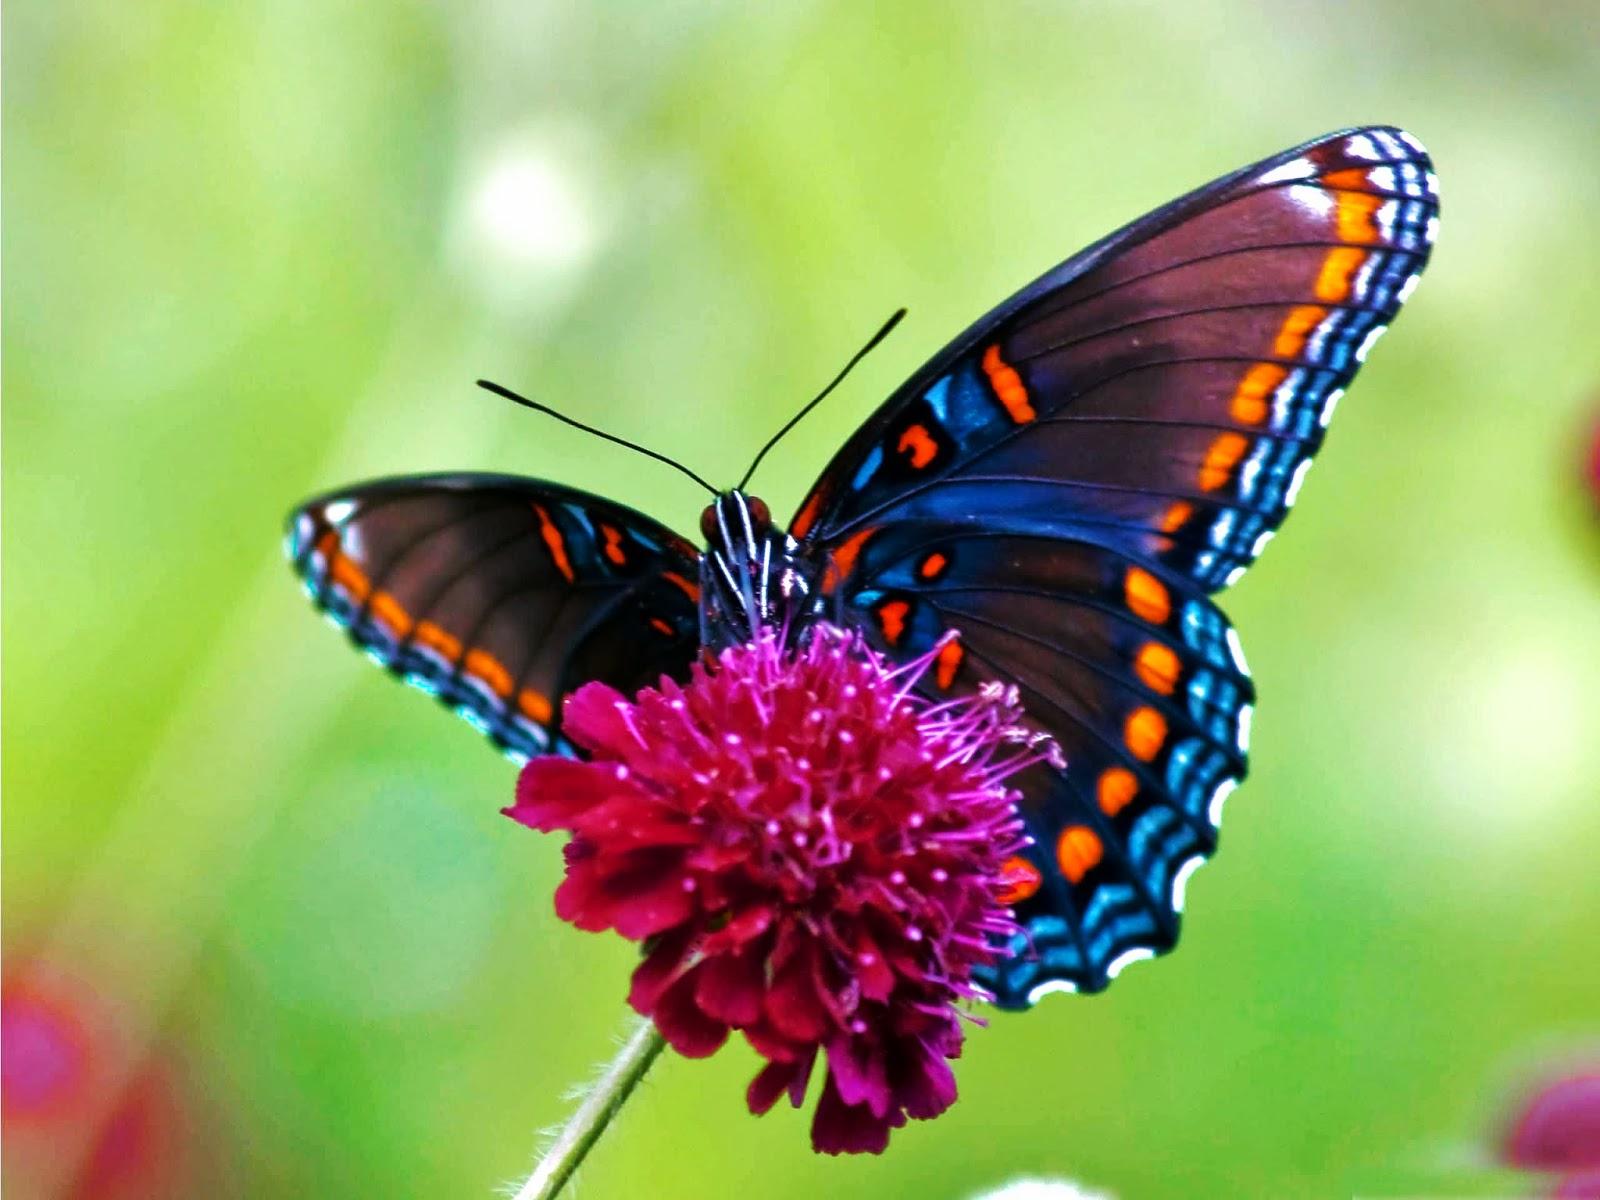 live butterfly wallpaper   beautiful desktop wallpapers 2014 1600x1200